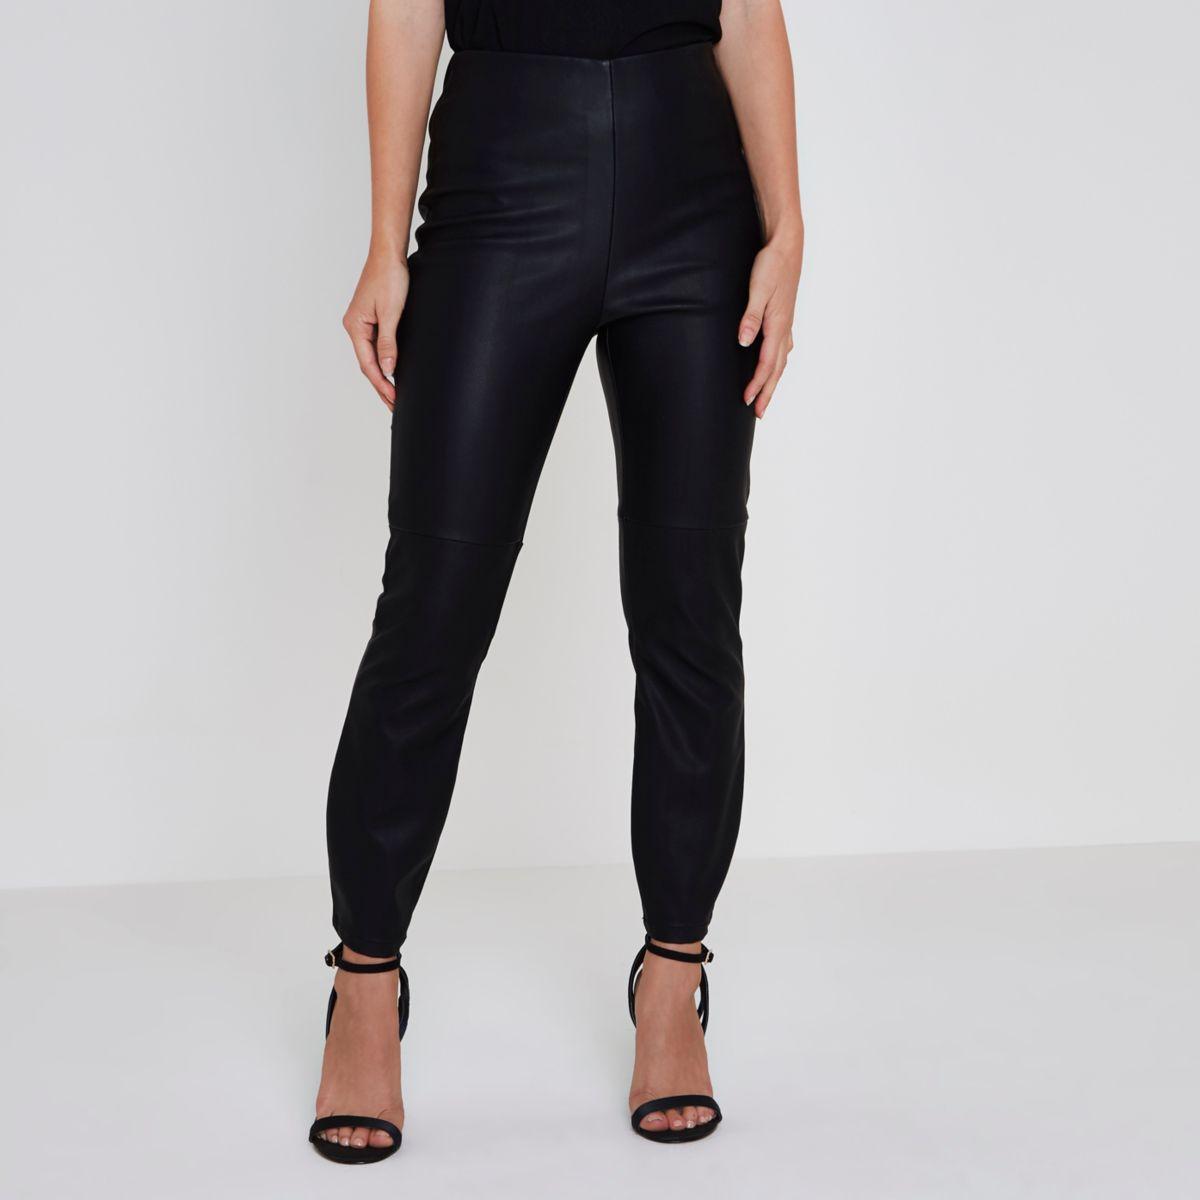 Petite black faux leather high rise pants